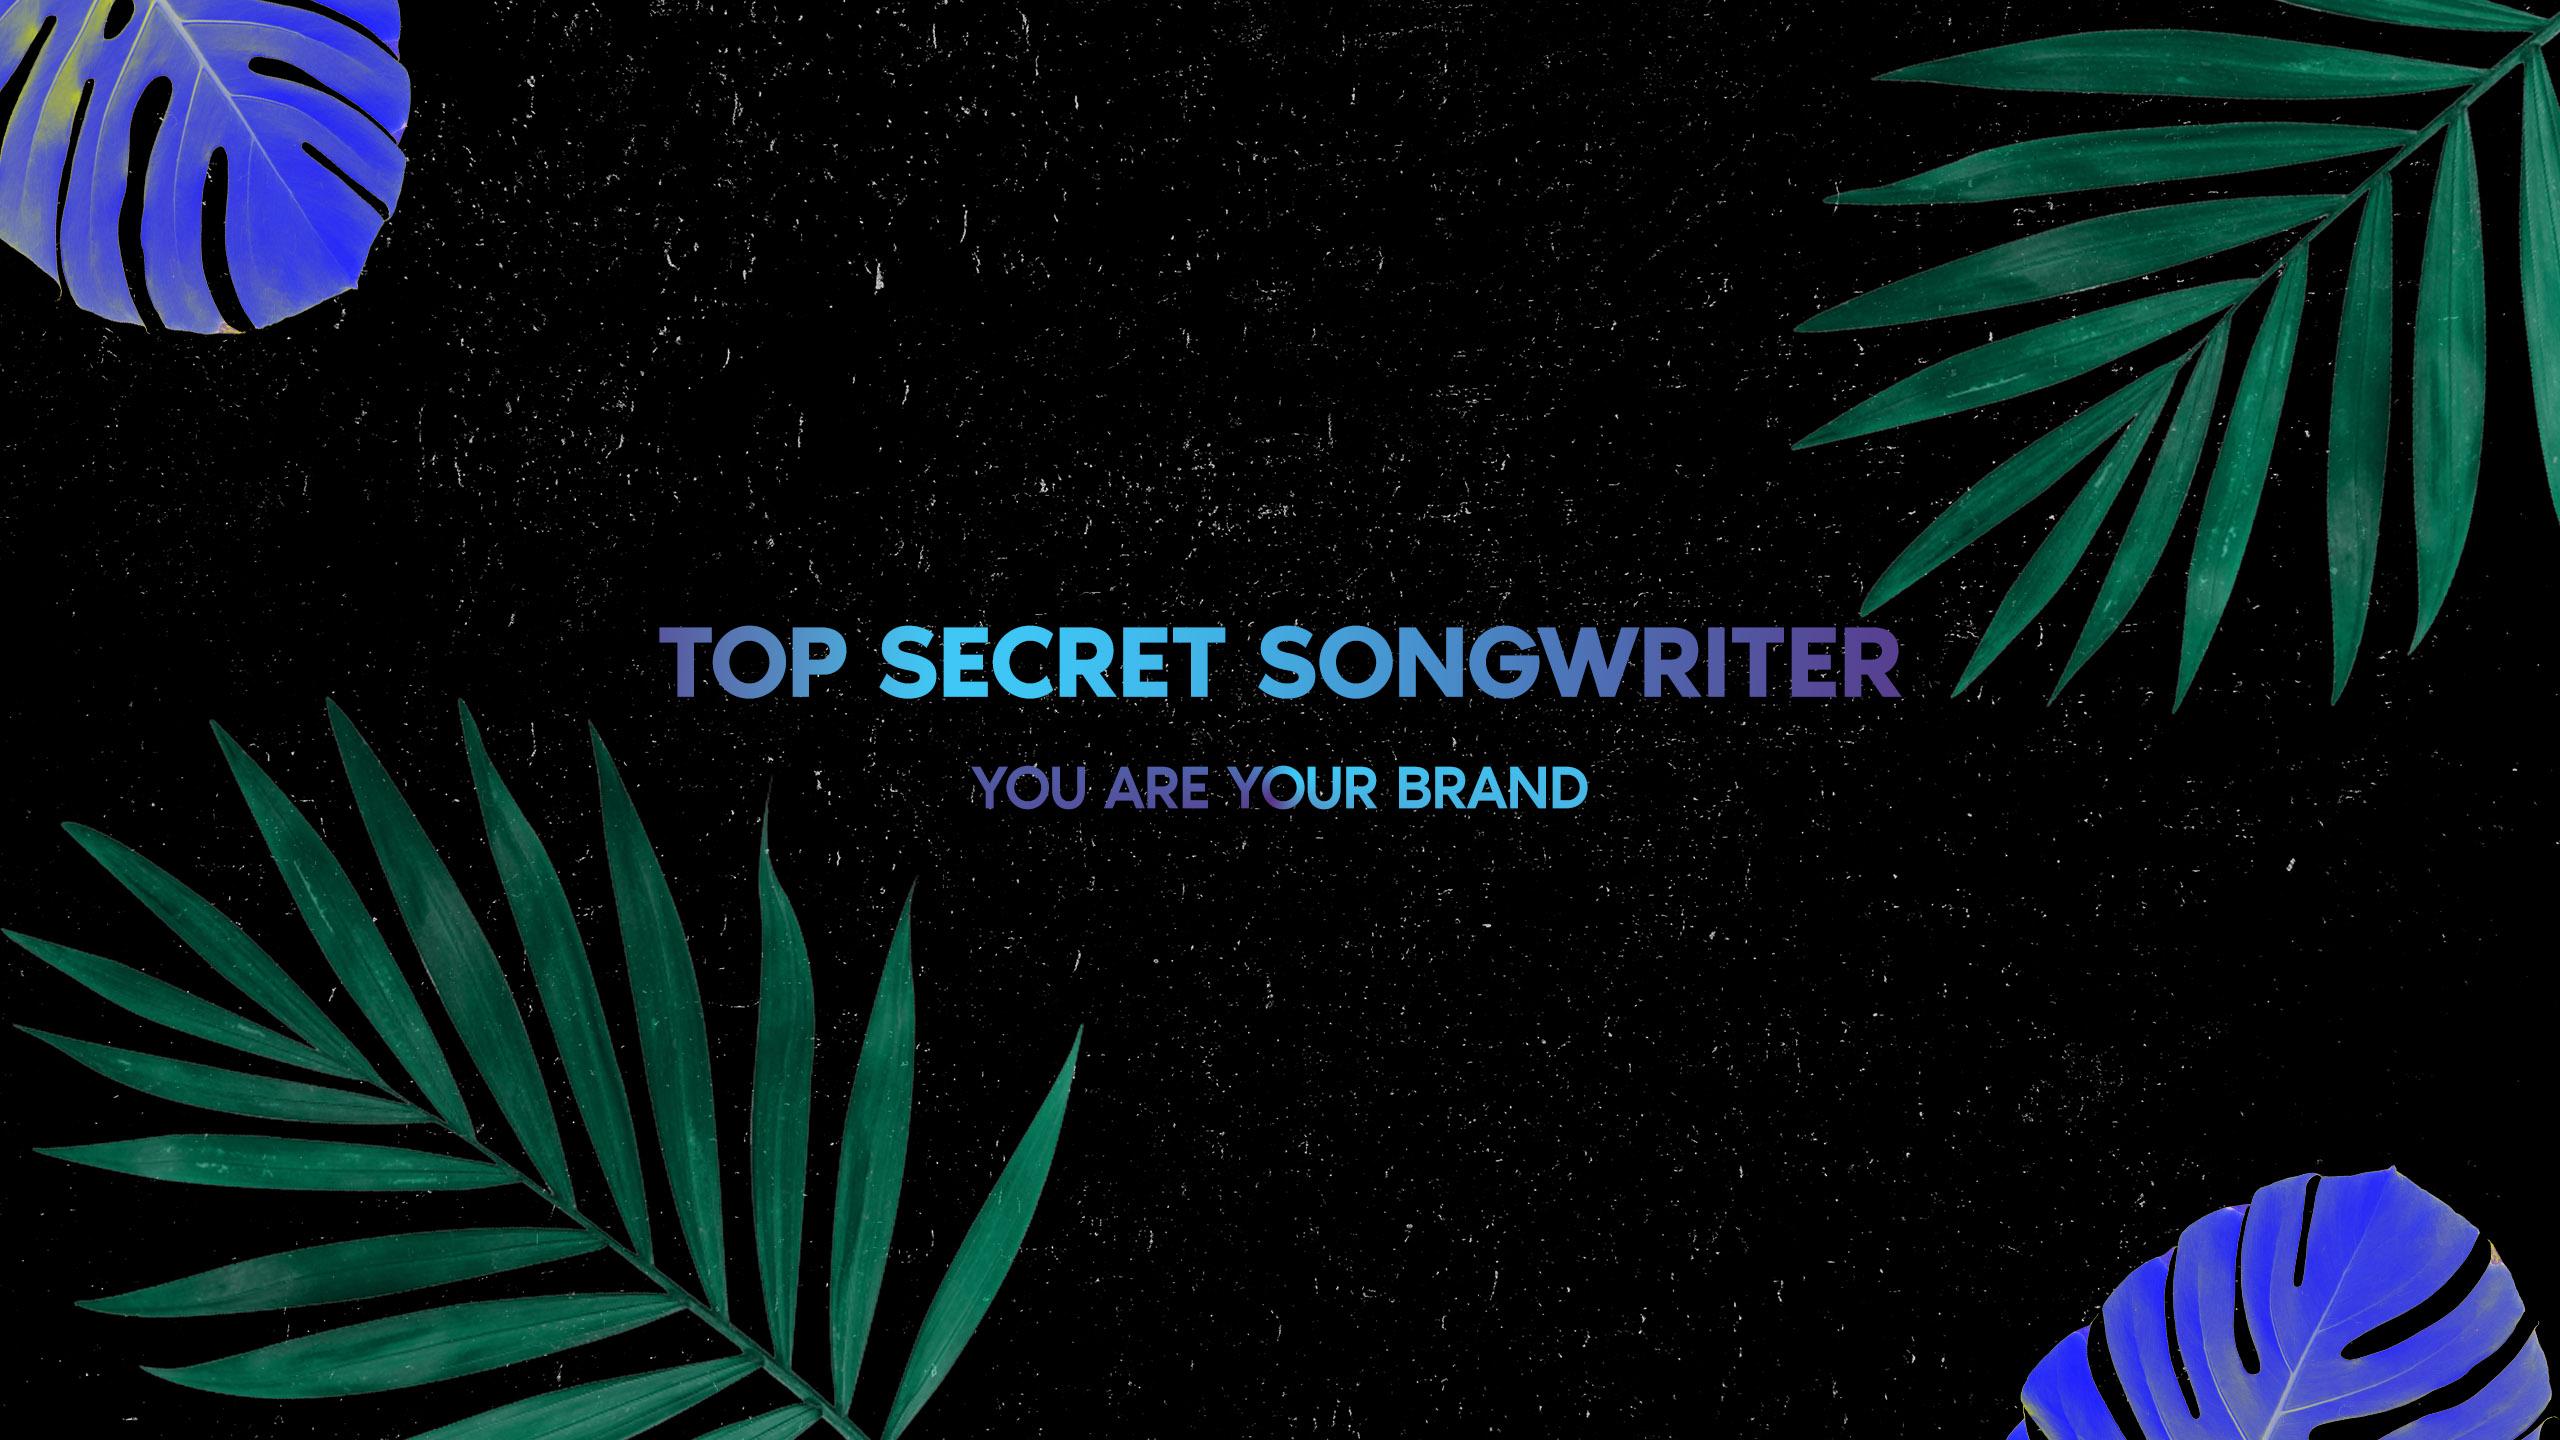 Topsecretsongwriter